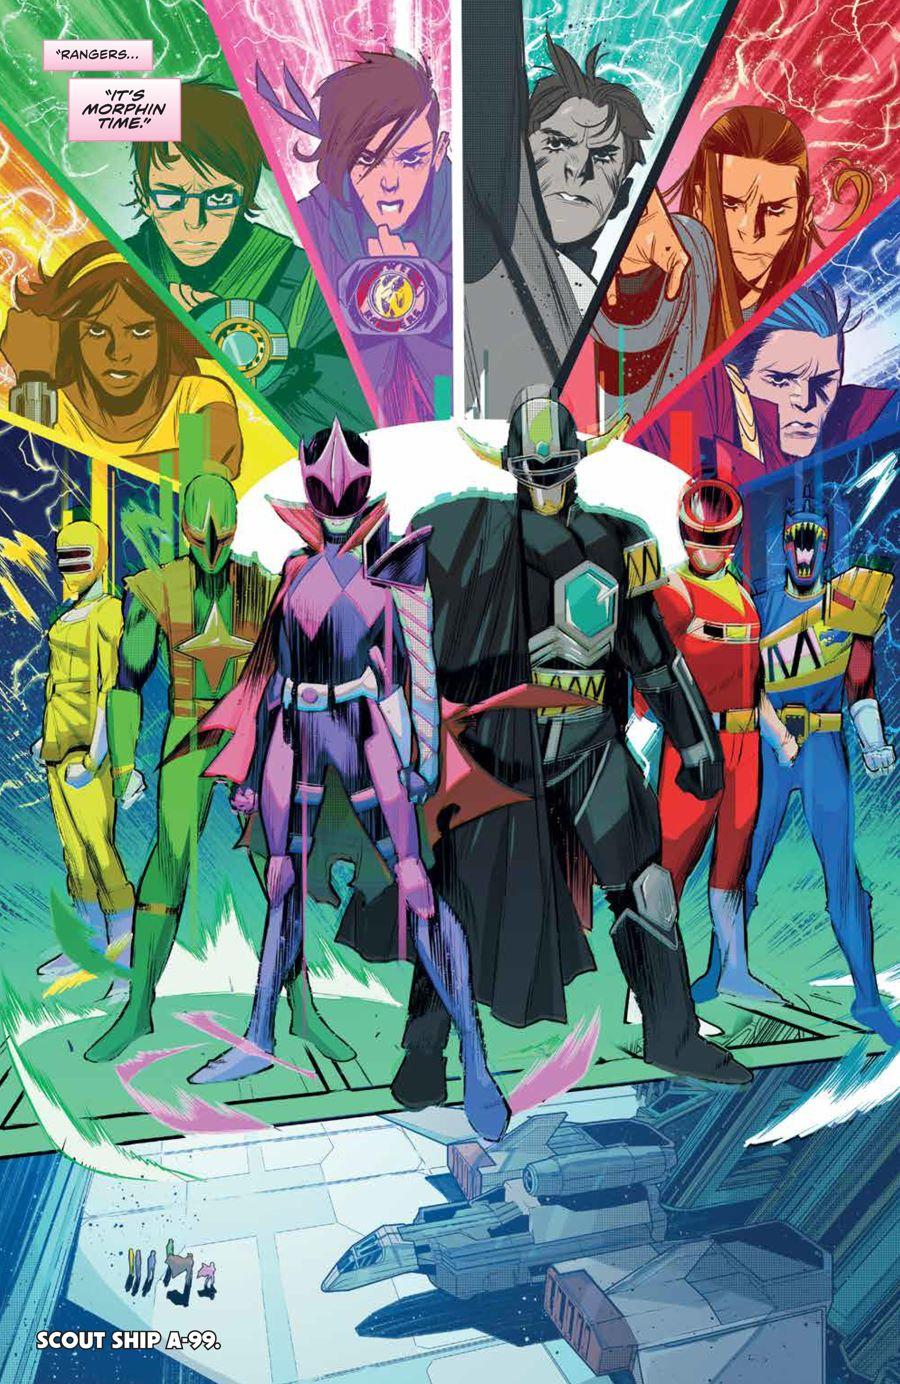 MMPR_BeyondGrid_SC_PRESS_21 ComicList Previews: MIGHTY MORPHIN POWER RANGERS BEYOND THE GRID TP